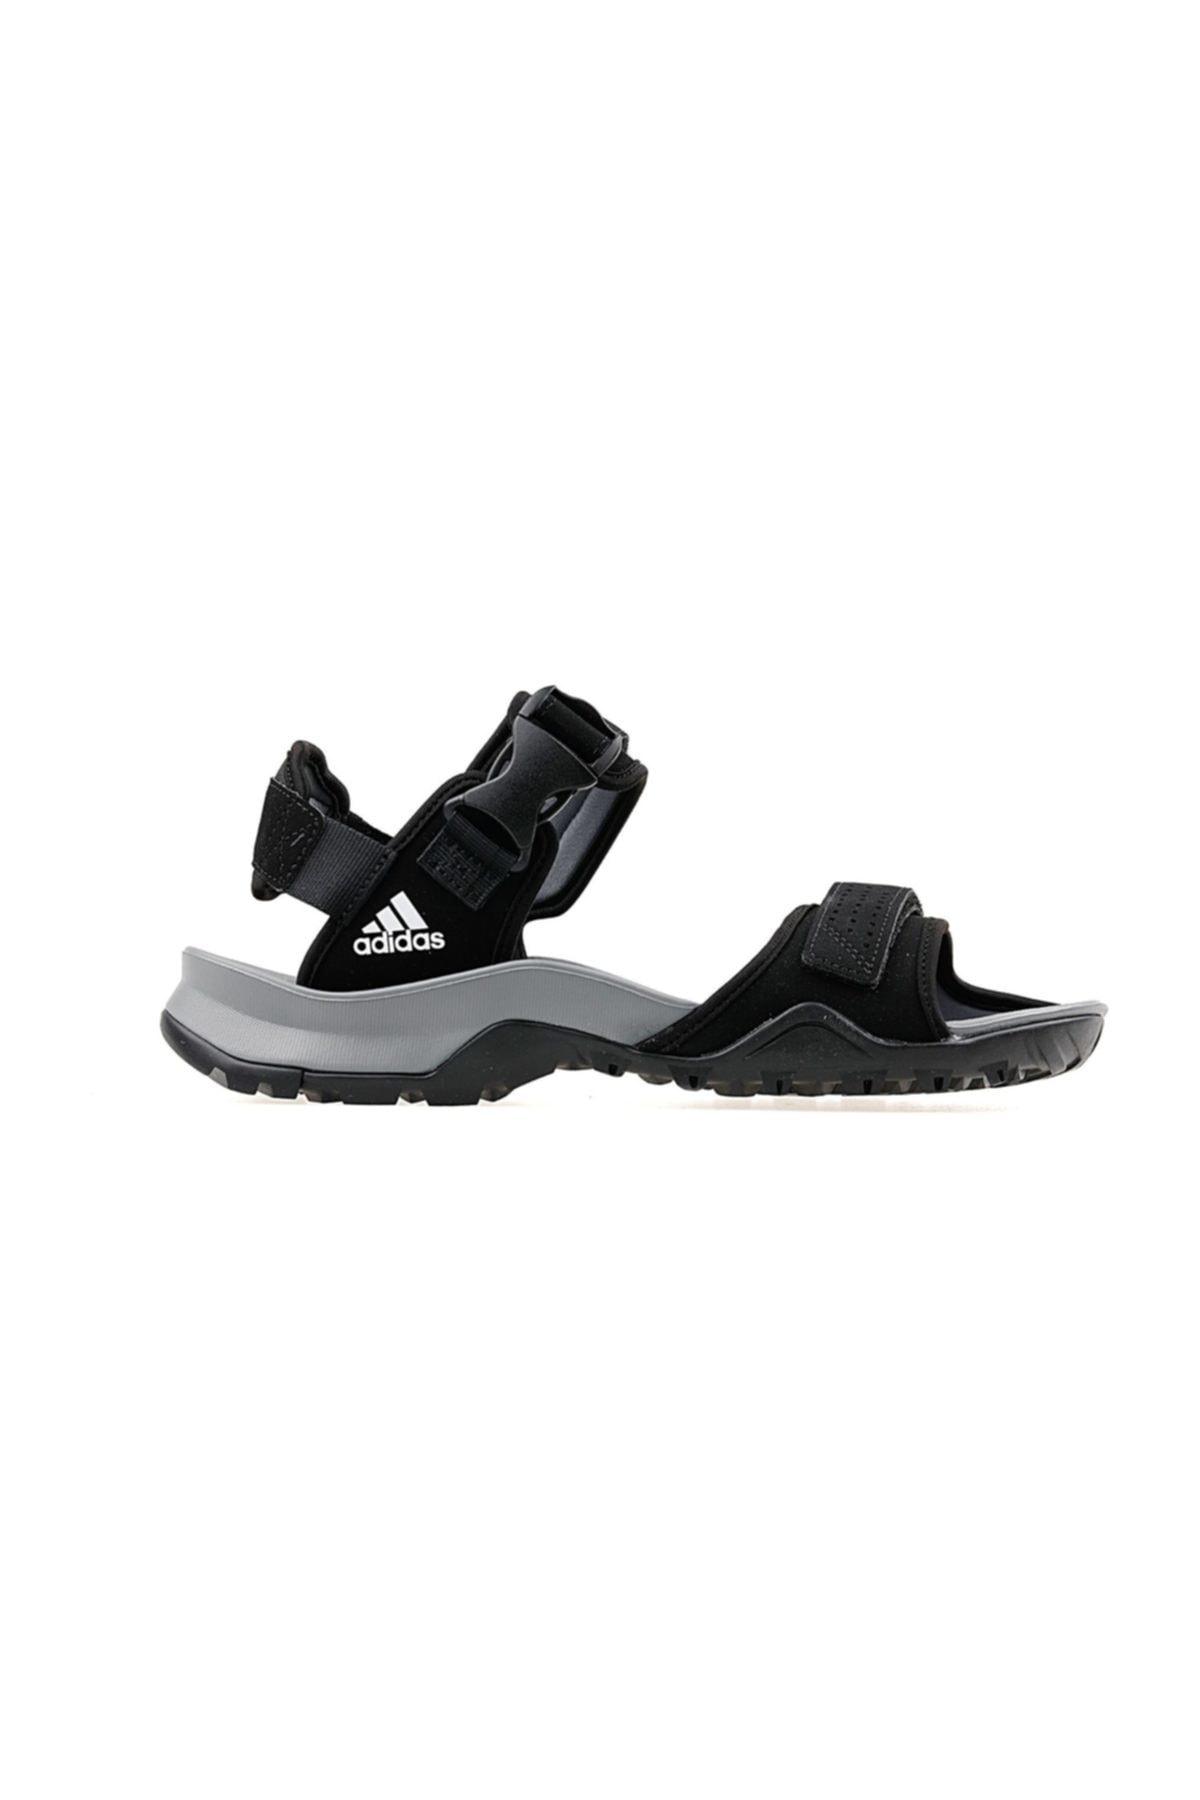 adidas Erkek Outdoor Sandaleti Spor Siyah B44191 Cyprex Ultra Sandalet 1